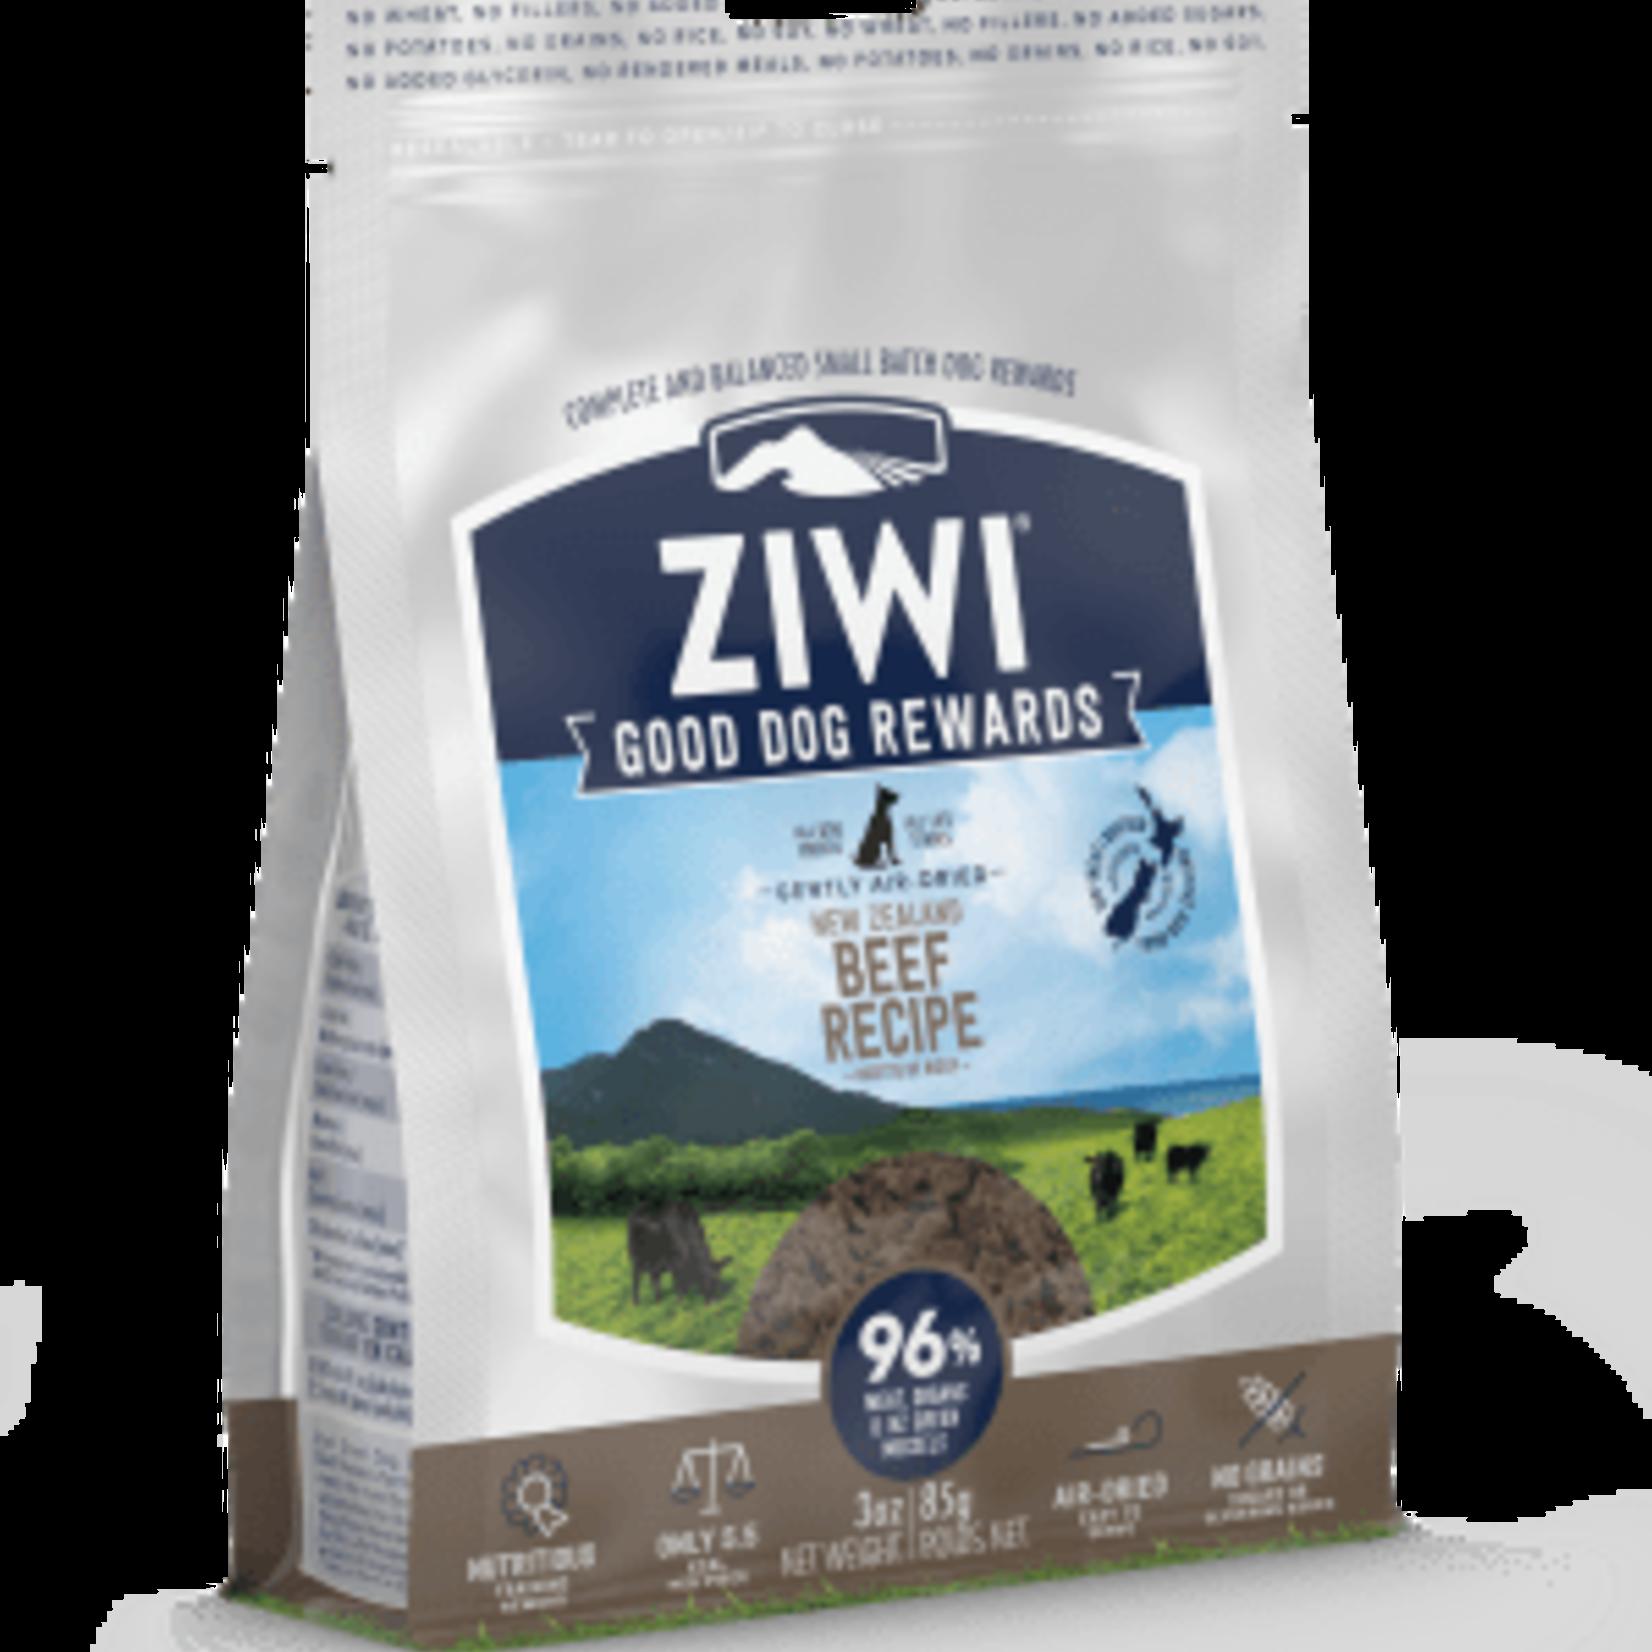 Ziwi Peak Ziwi Peak Dog Beef Rewards 3 OZ